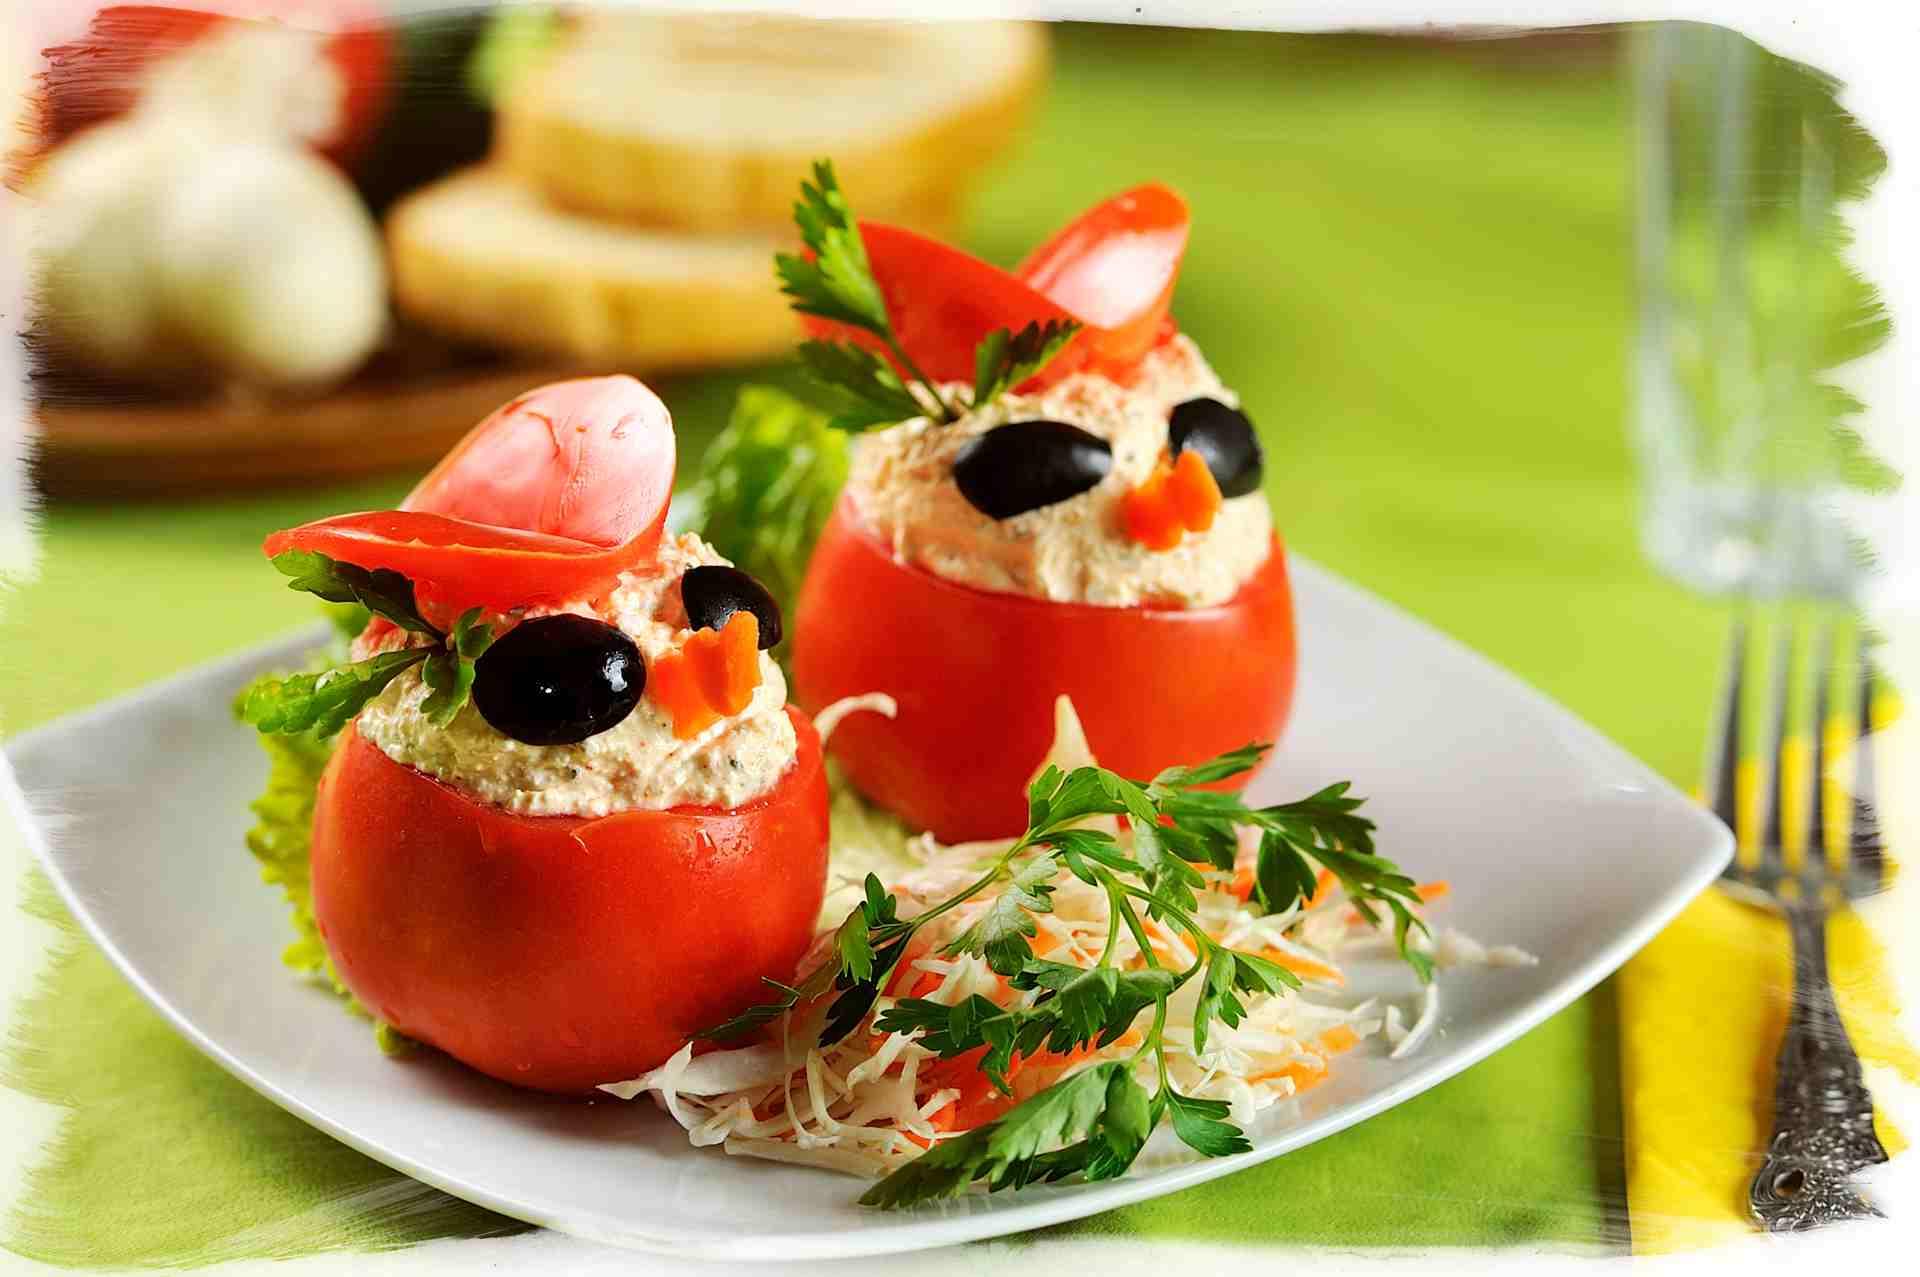 salad,food,restaurant